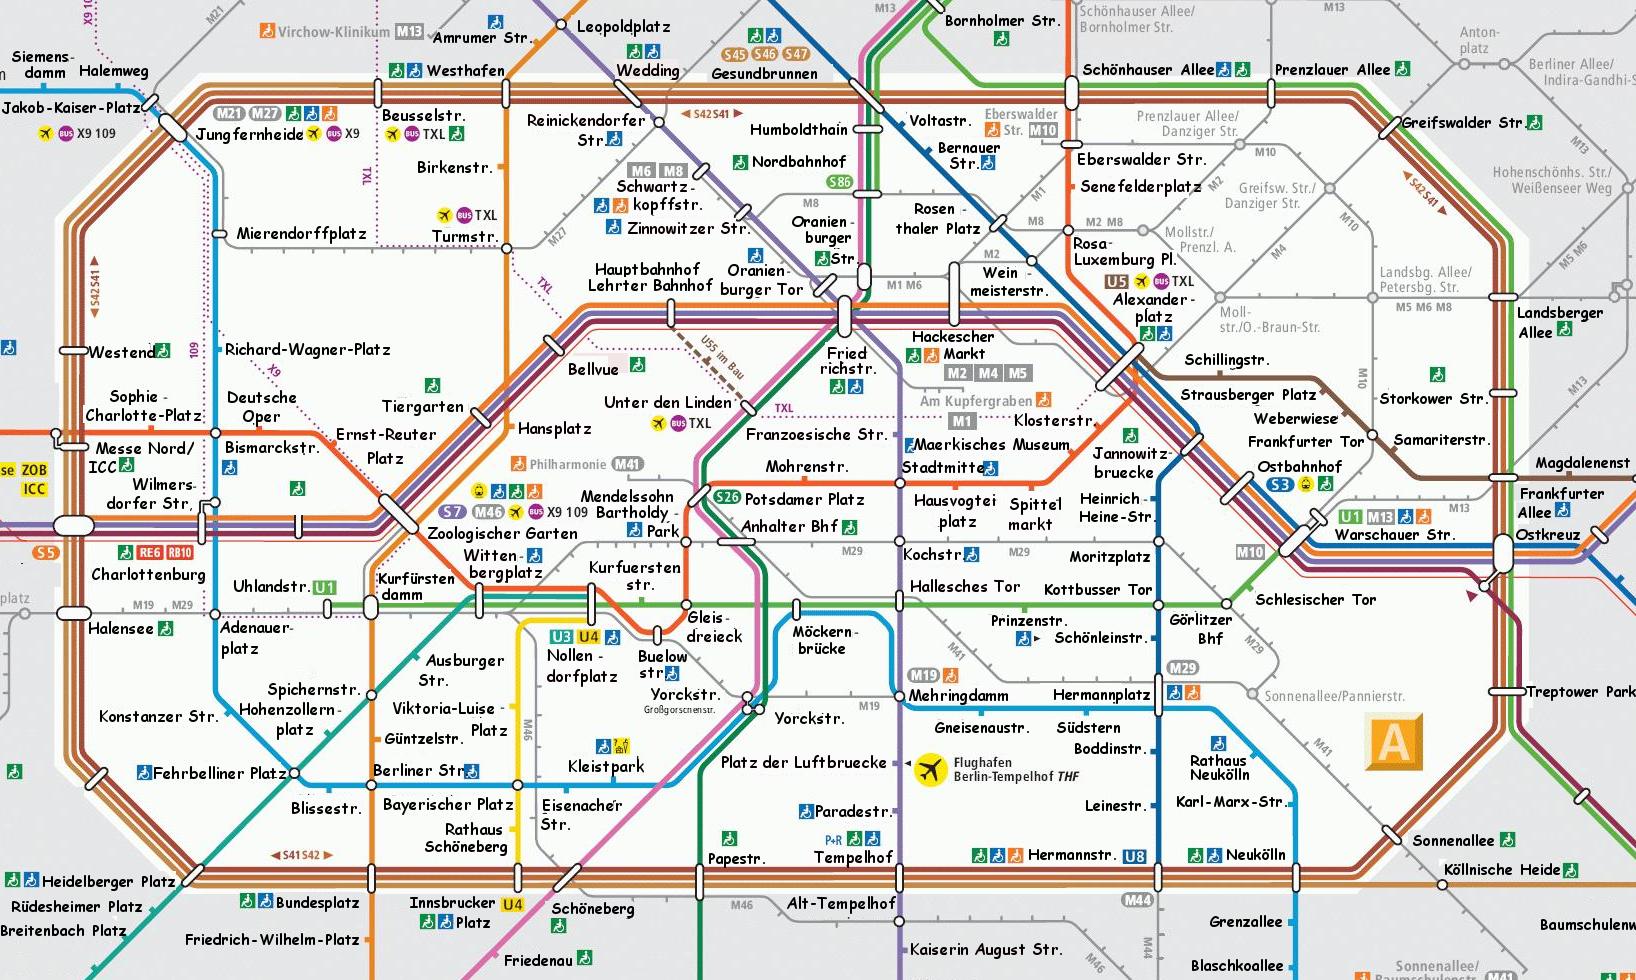 U Bahn Map Berlin U Bahn Map with actual names of Stations but in Comic Sans U Bahn Map